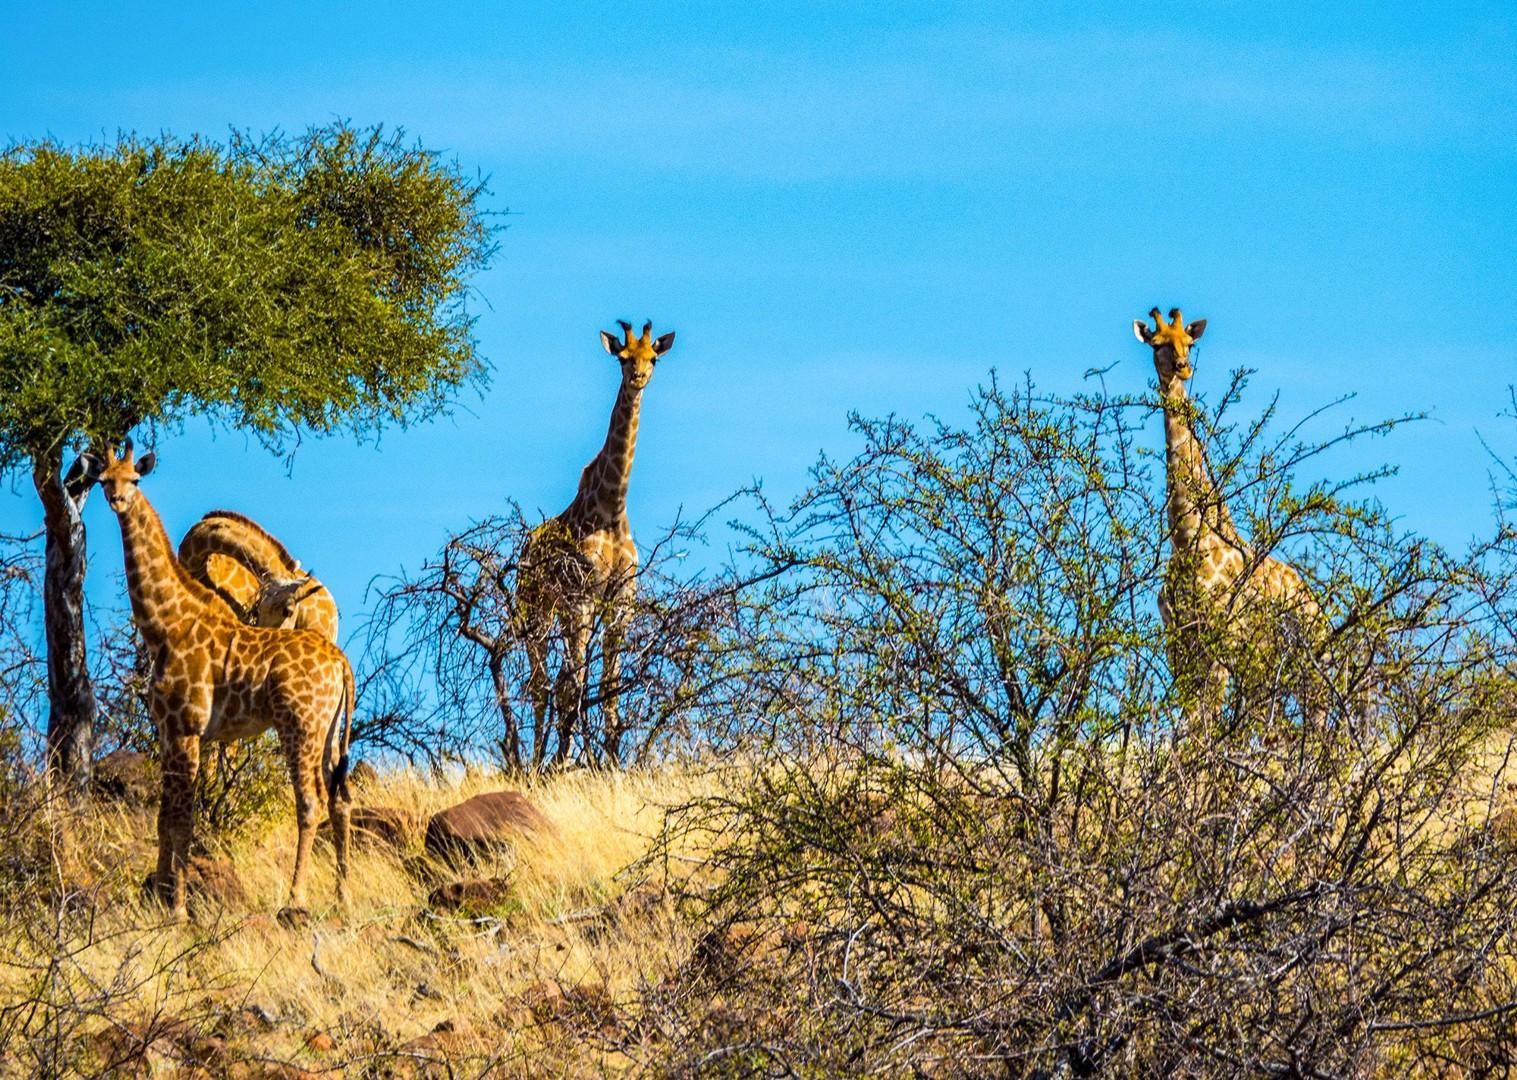 south-africa-mtb-botswana-giraffes-biking-holiday-land-of-the-giants-trip.jpg - NEW! South Africa and Botswana - Mountain Biking